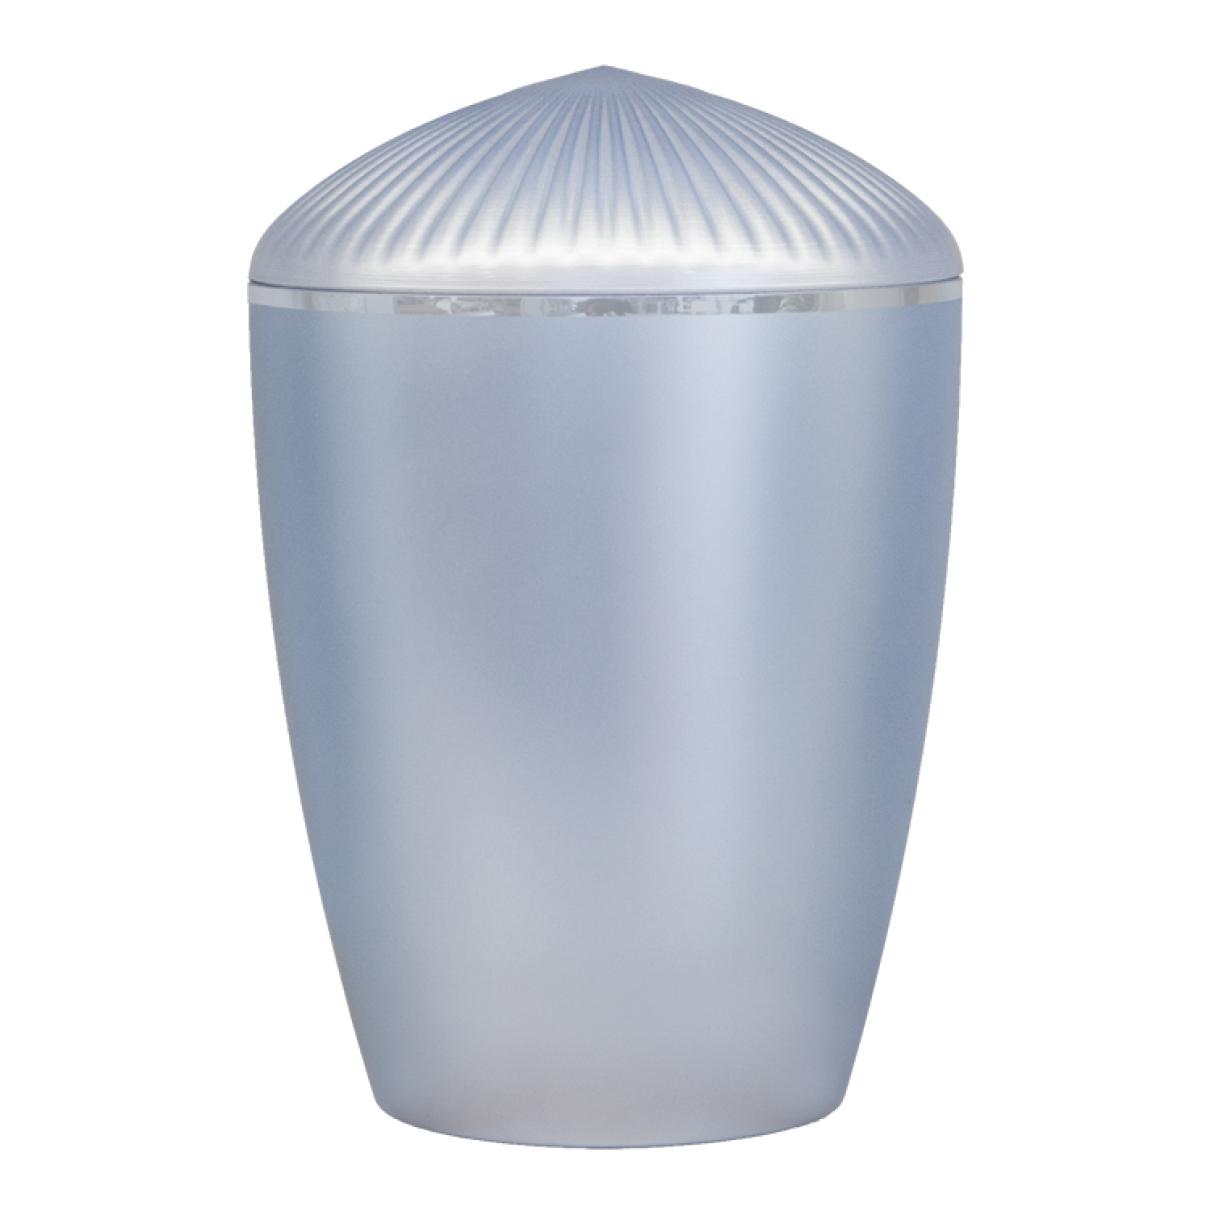 Ferndown Silver Band Cremation Urn – Light Blue